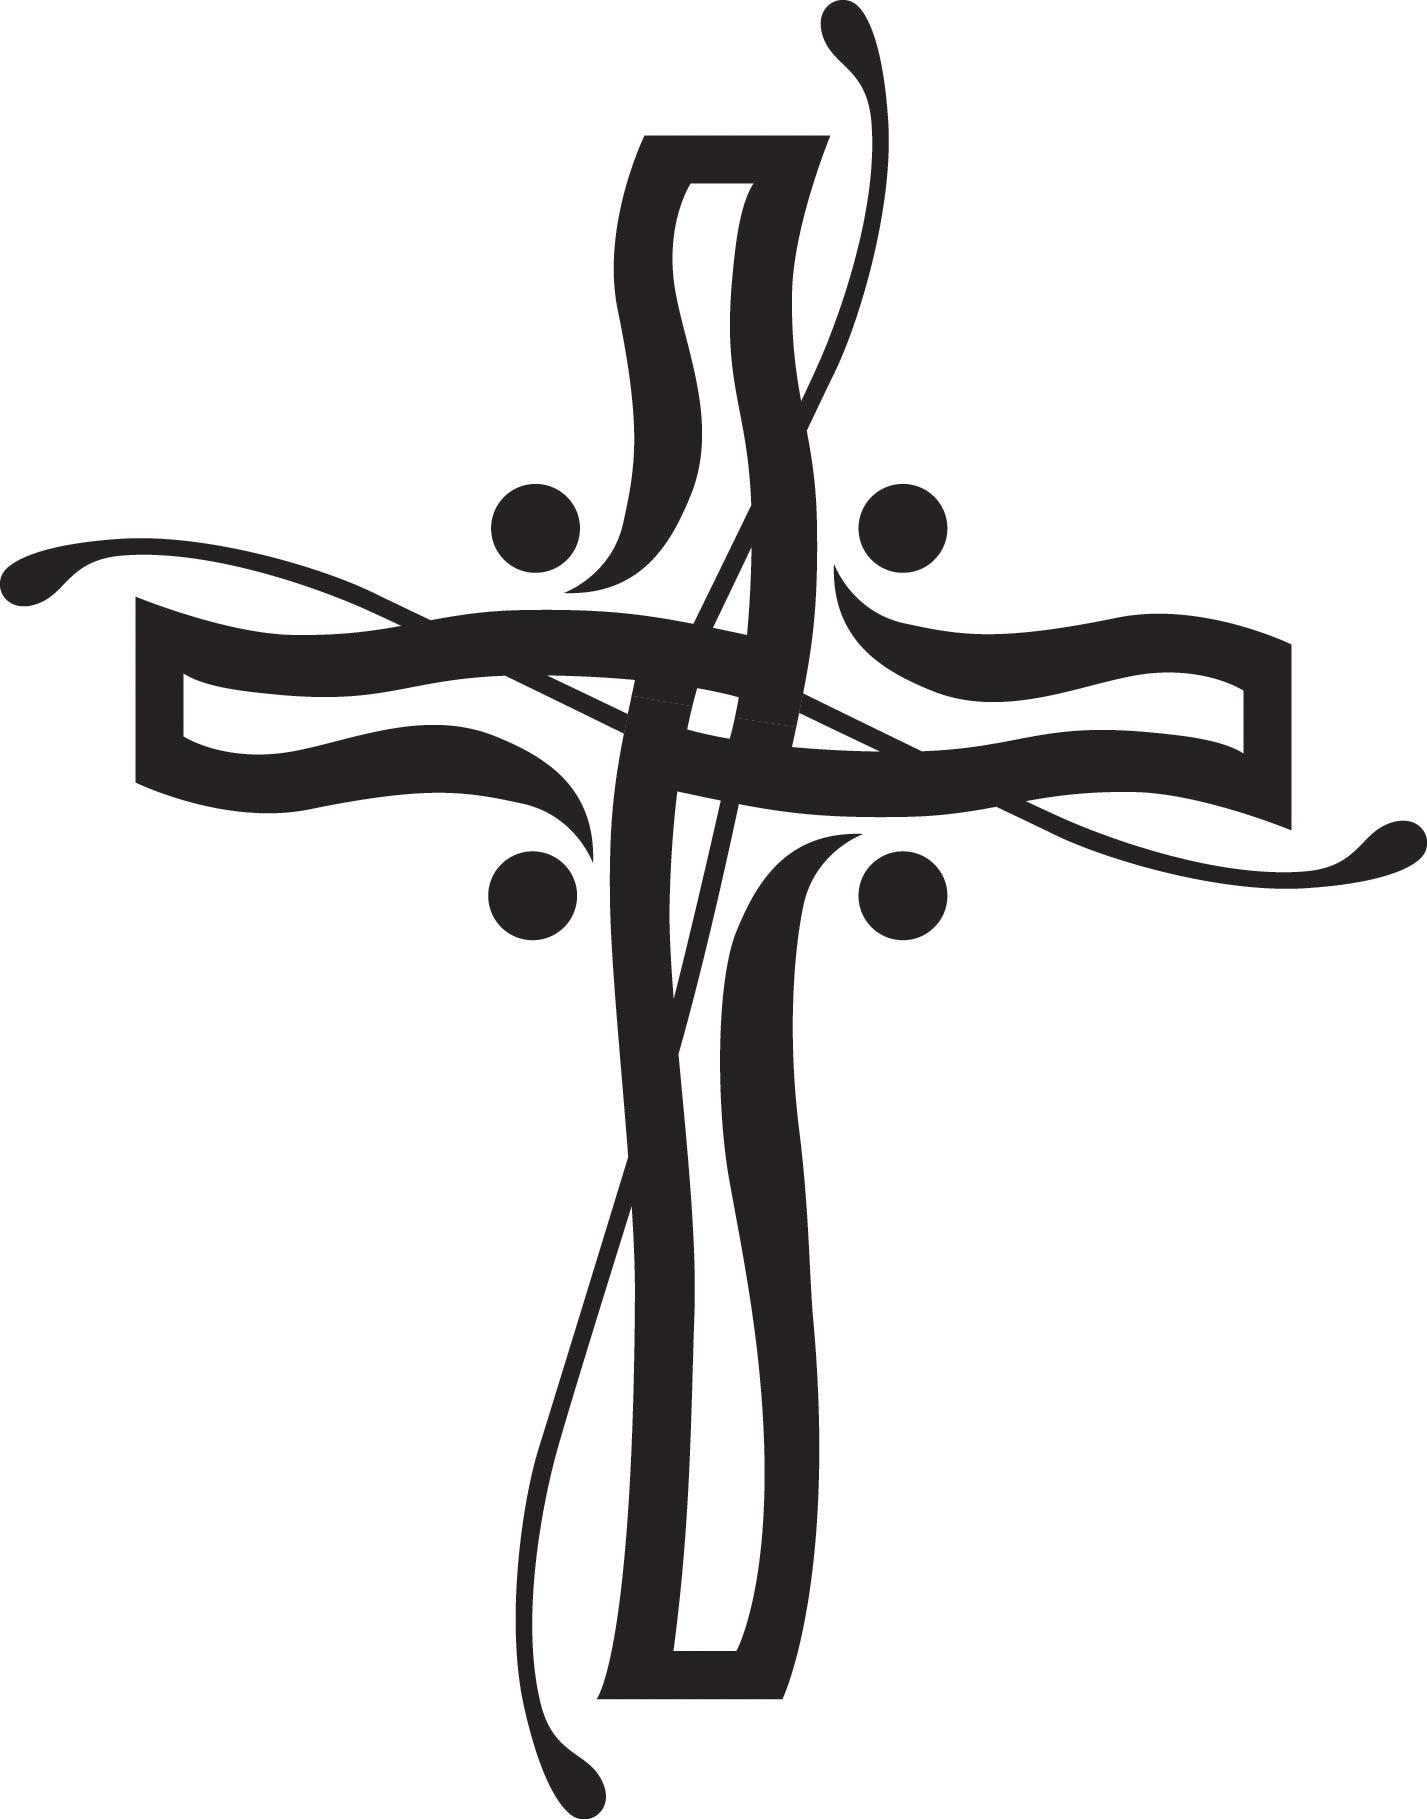 Free Patriotic Christian Cliparts, Download Free Clip Art